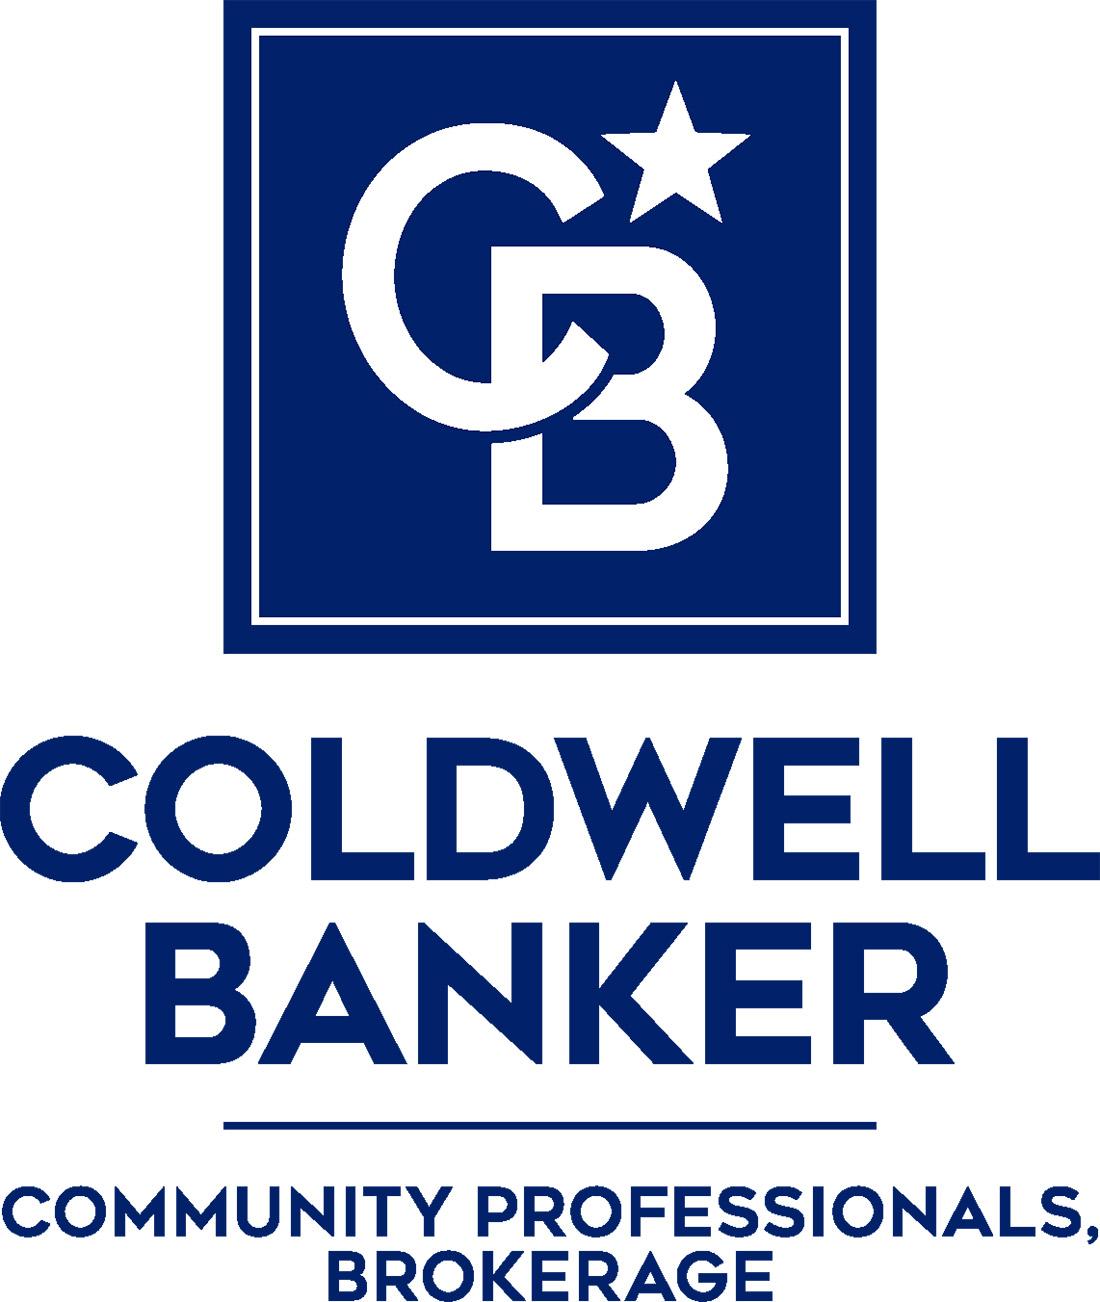 Judi Caplan - Coldwell Banker Community Professionals Logo